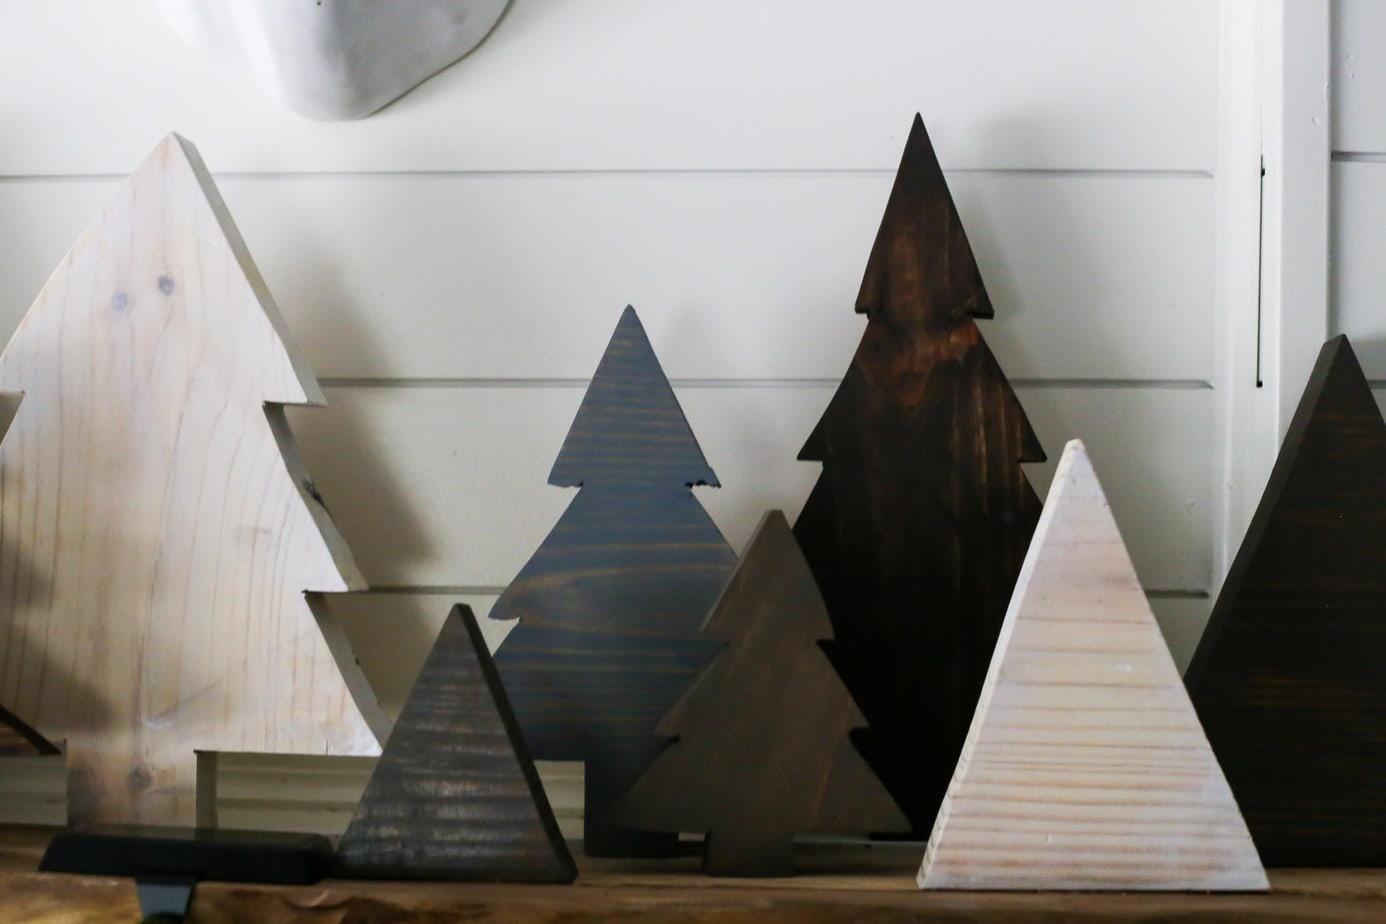 How to make simple DIY scrap wood Christmas trees